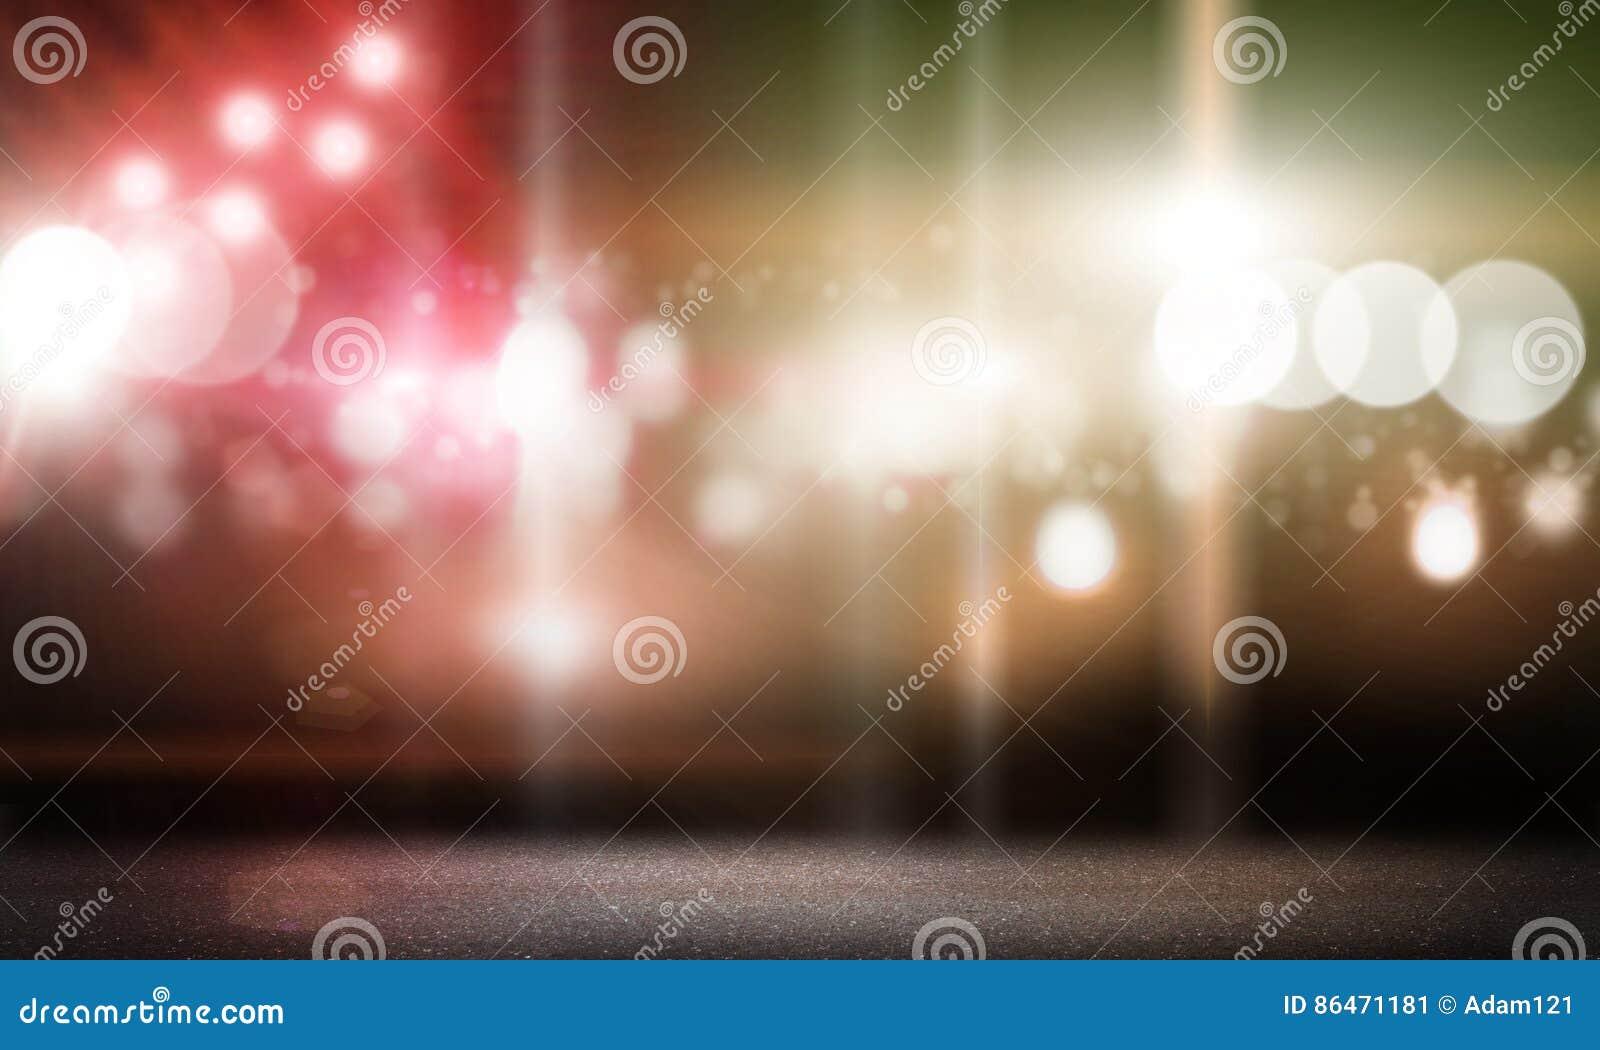 Metta in scena gli indicatori luminosi